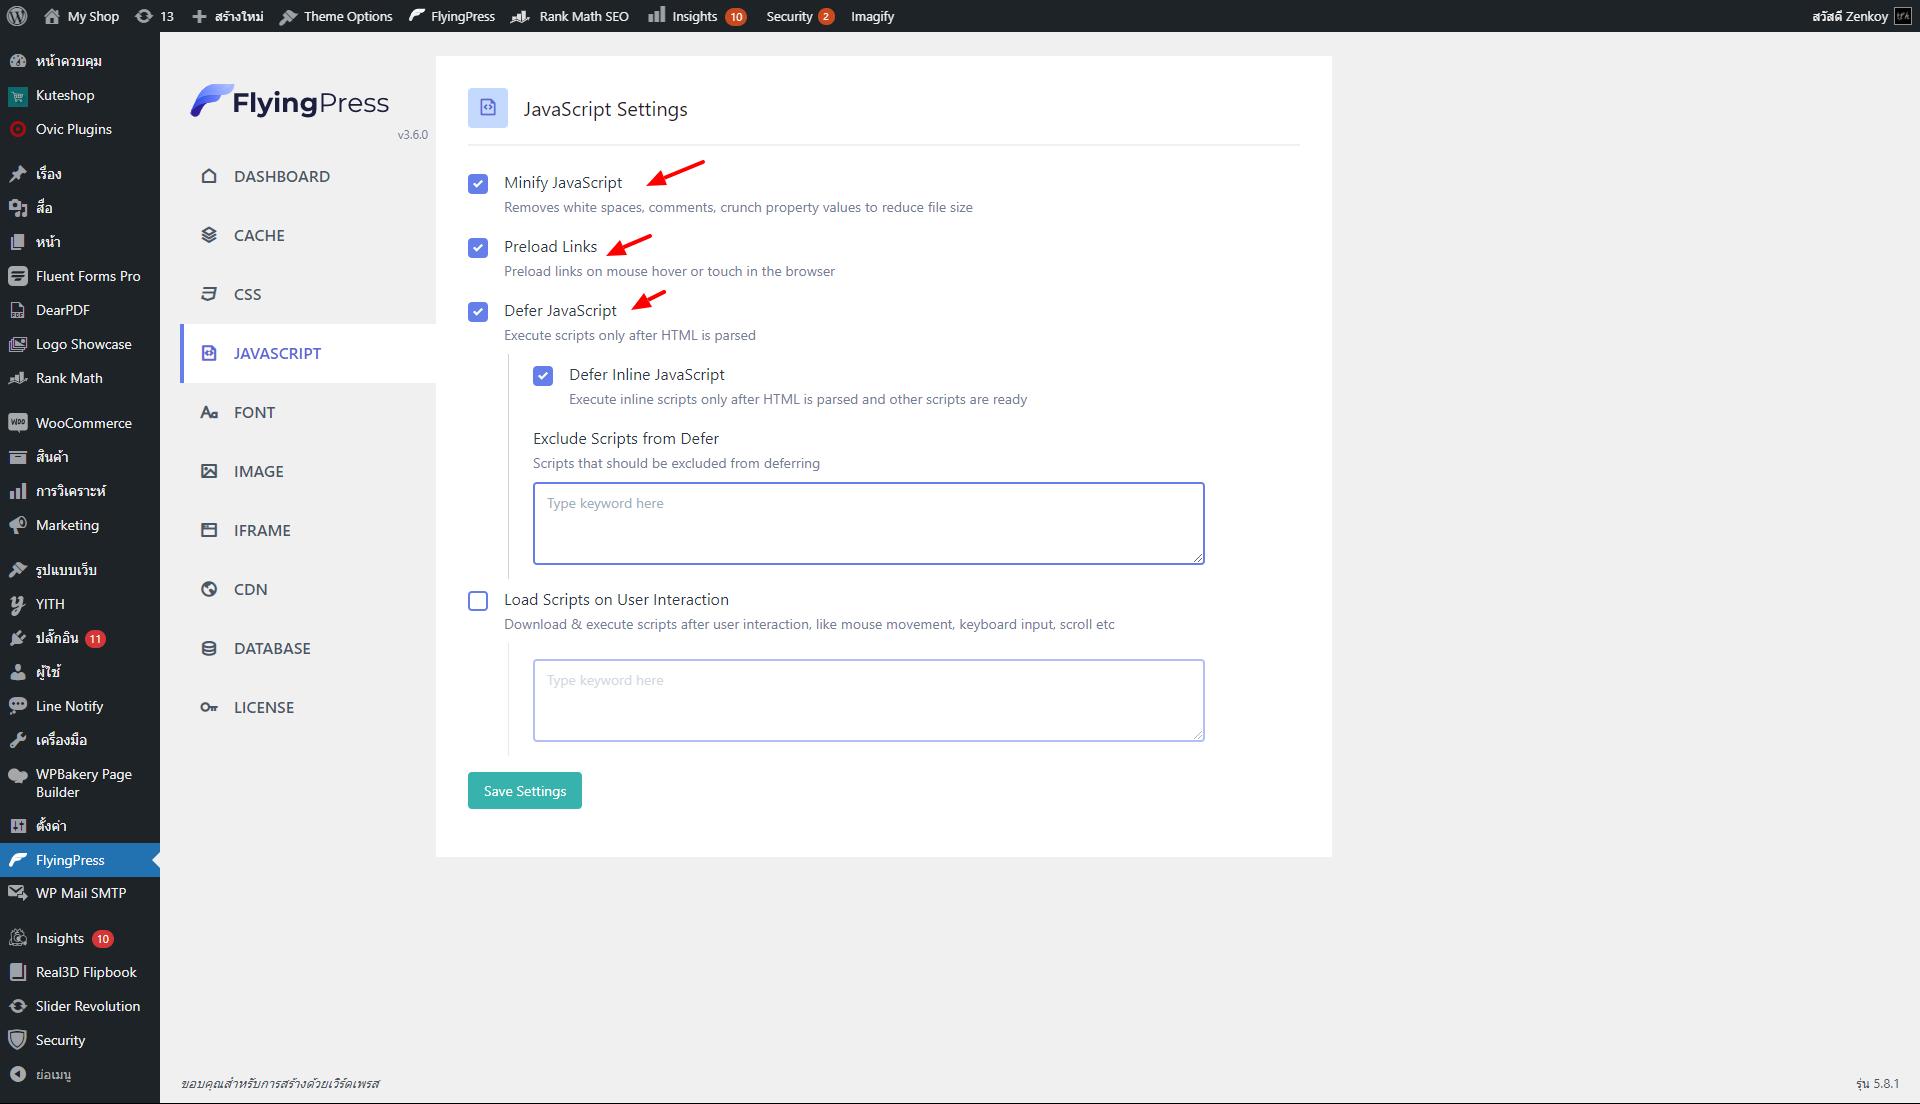 FlyingPress JavaScript Settings